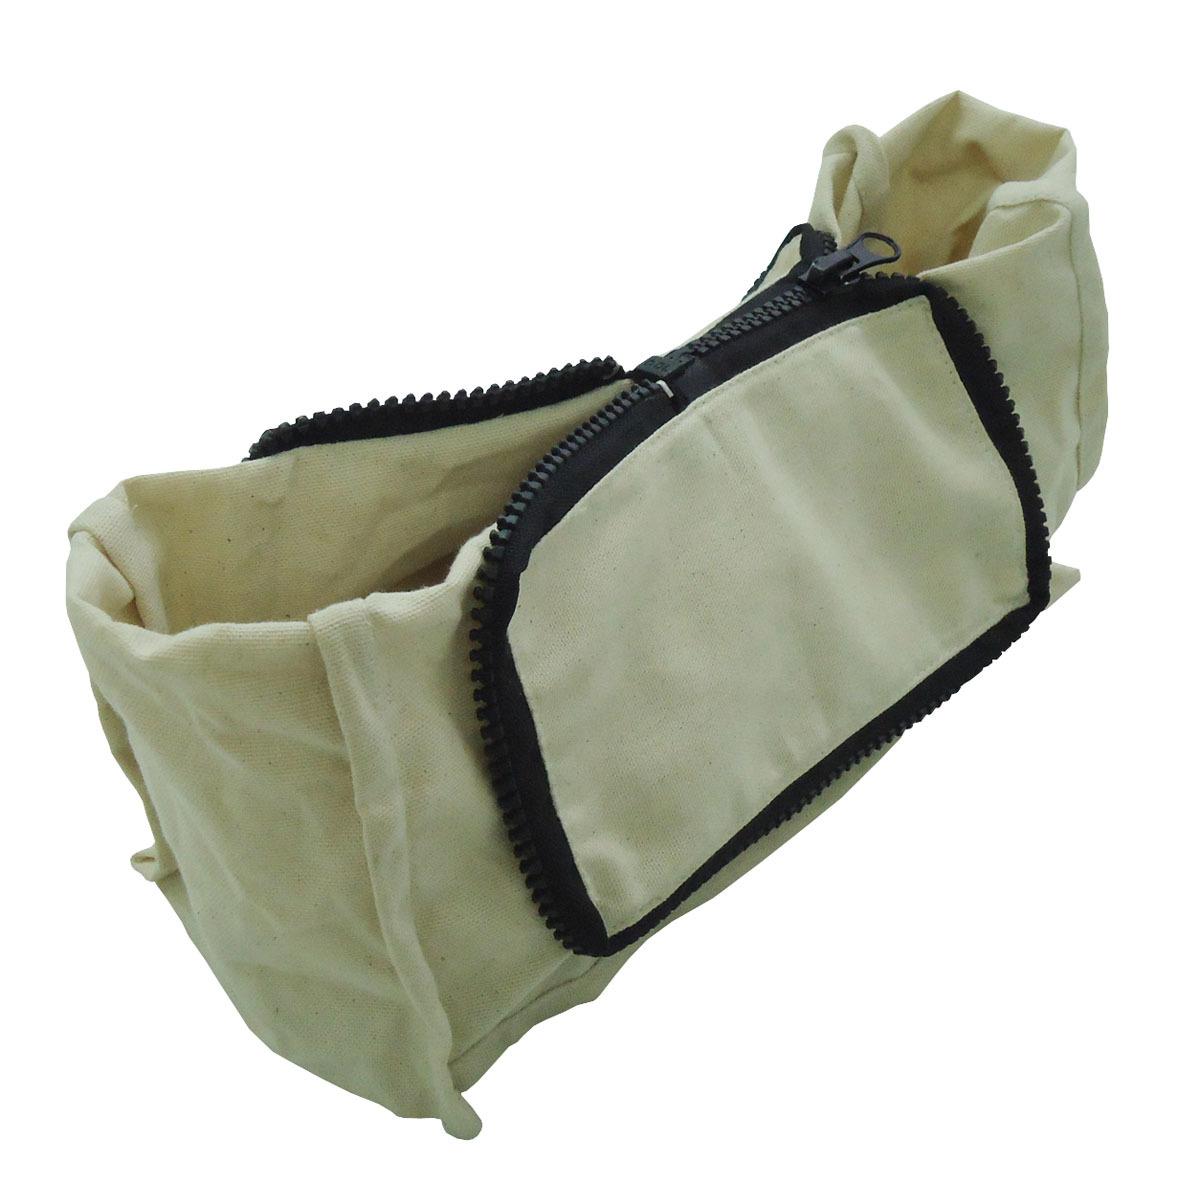 8 Oz Natural Cotton Canvas Folding Shopping Tote Bag